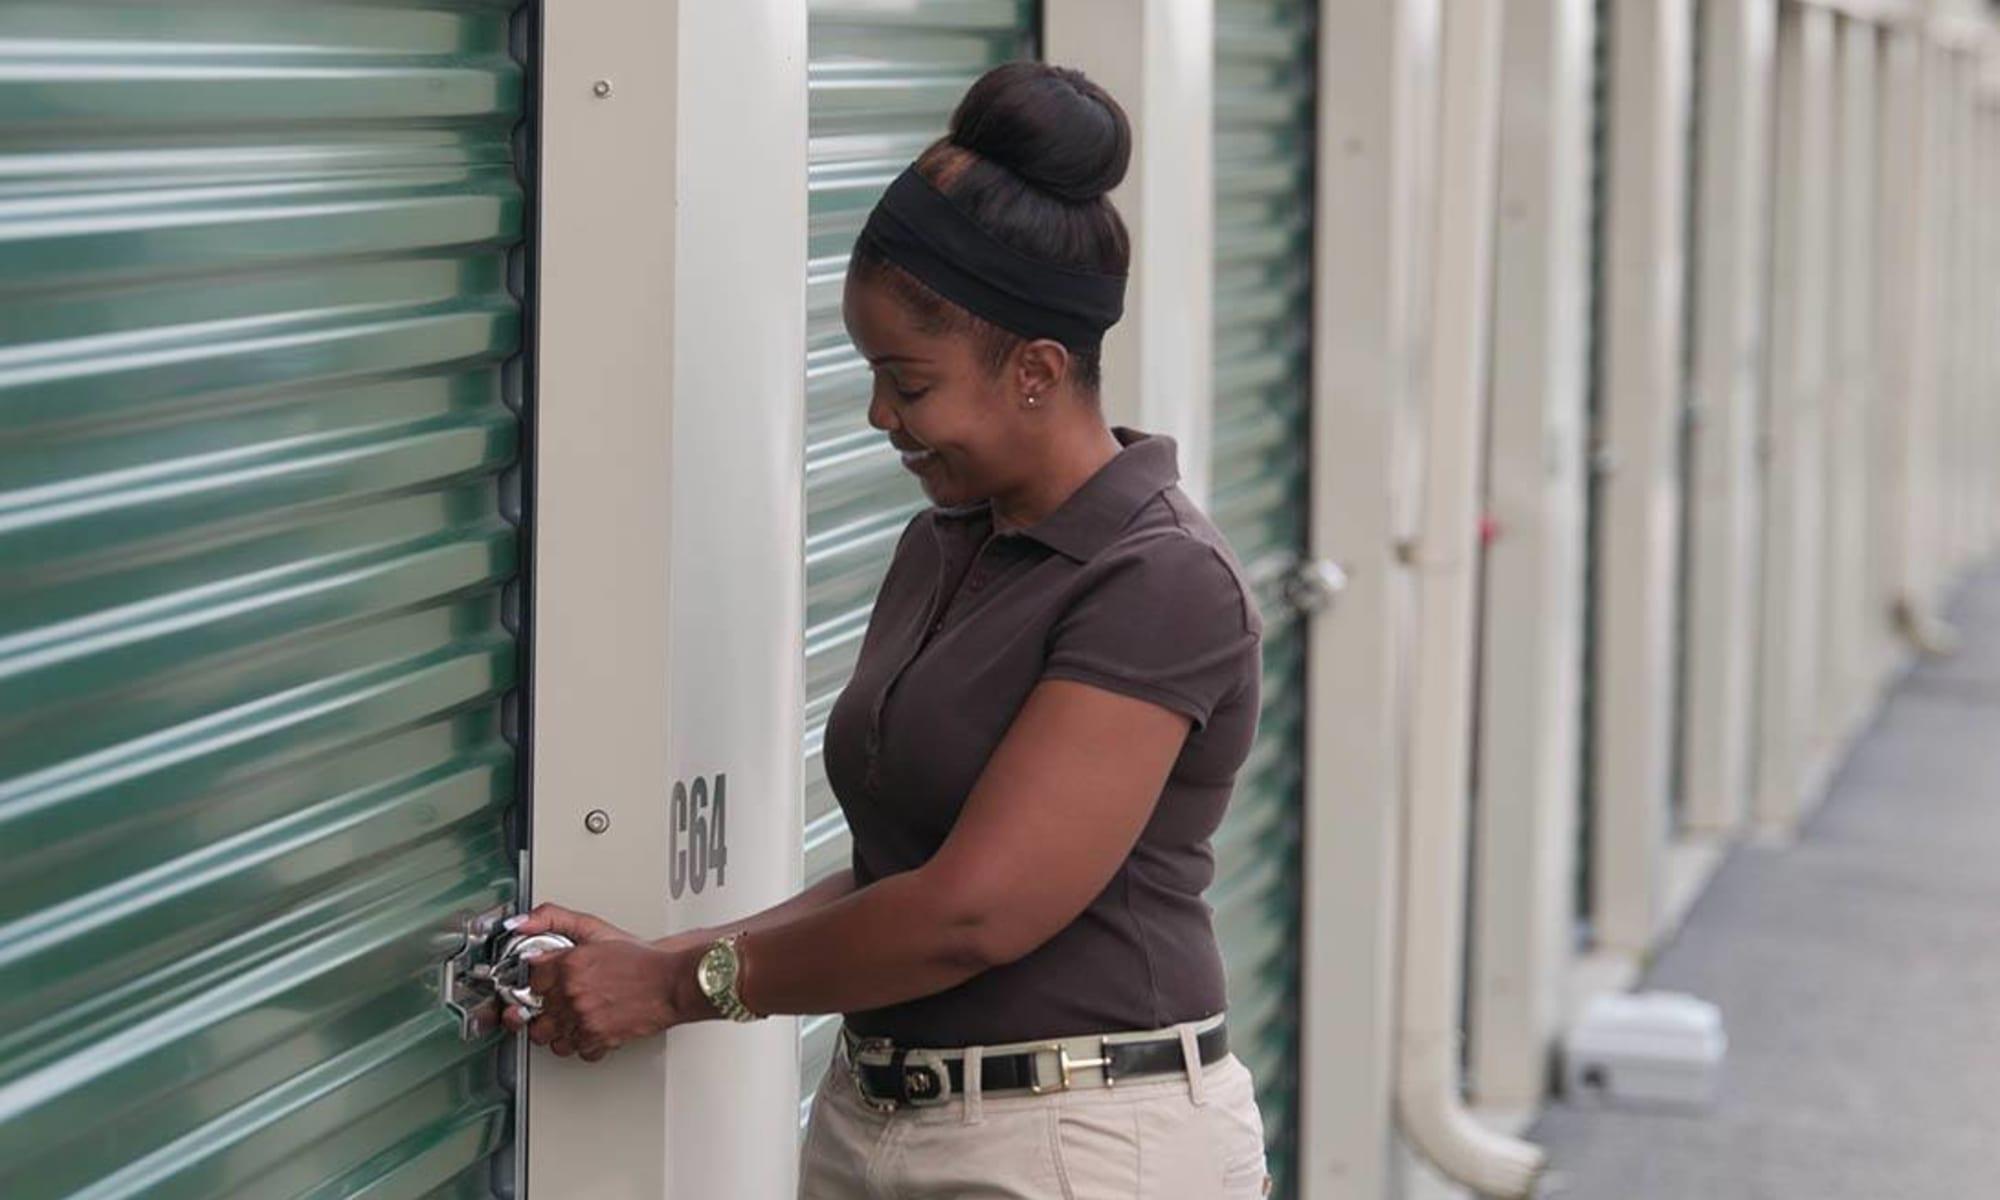 A customer secures her unit at Virginia Varsity Storage in Christiansburg, Virginia